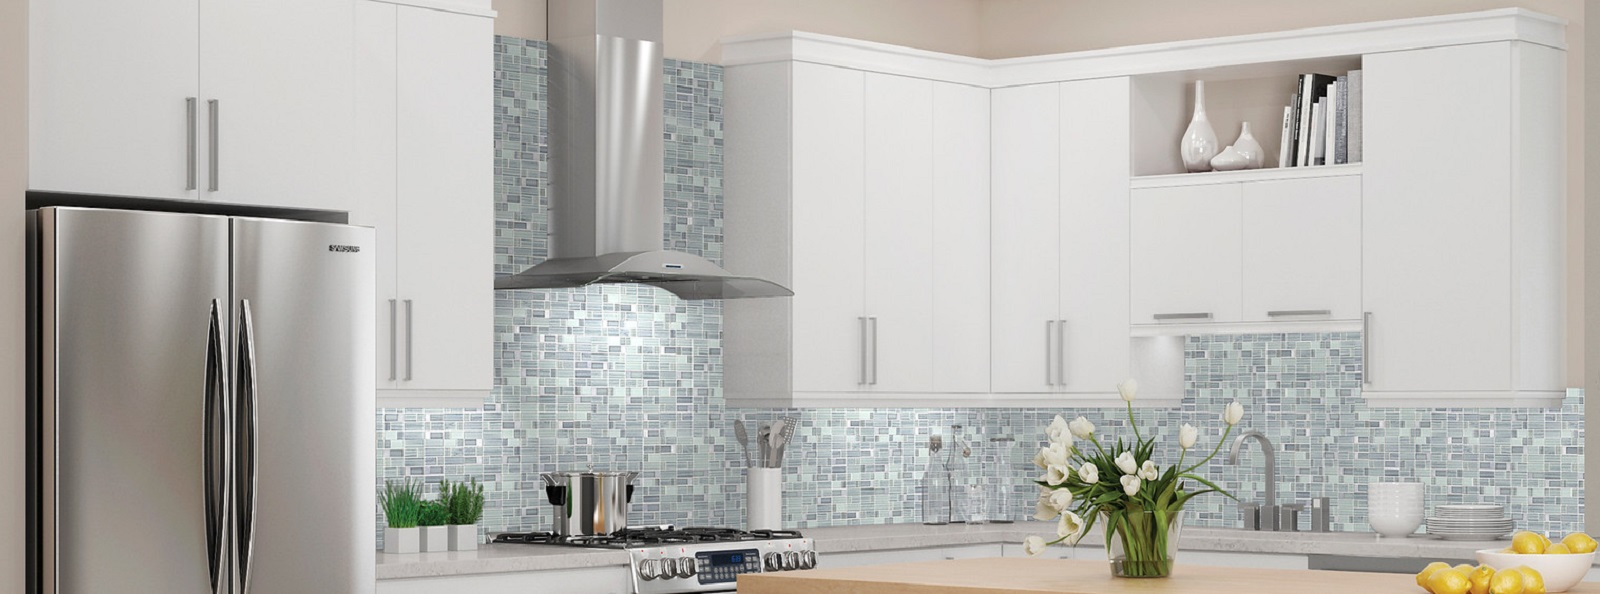 use mosaic tile beyond the kitchen